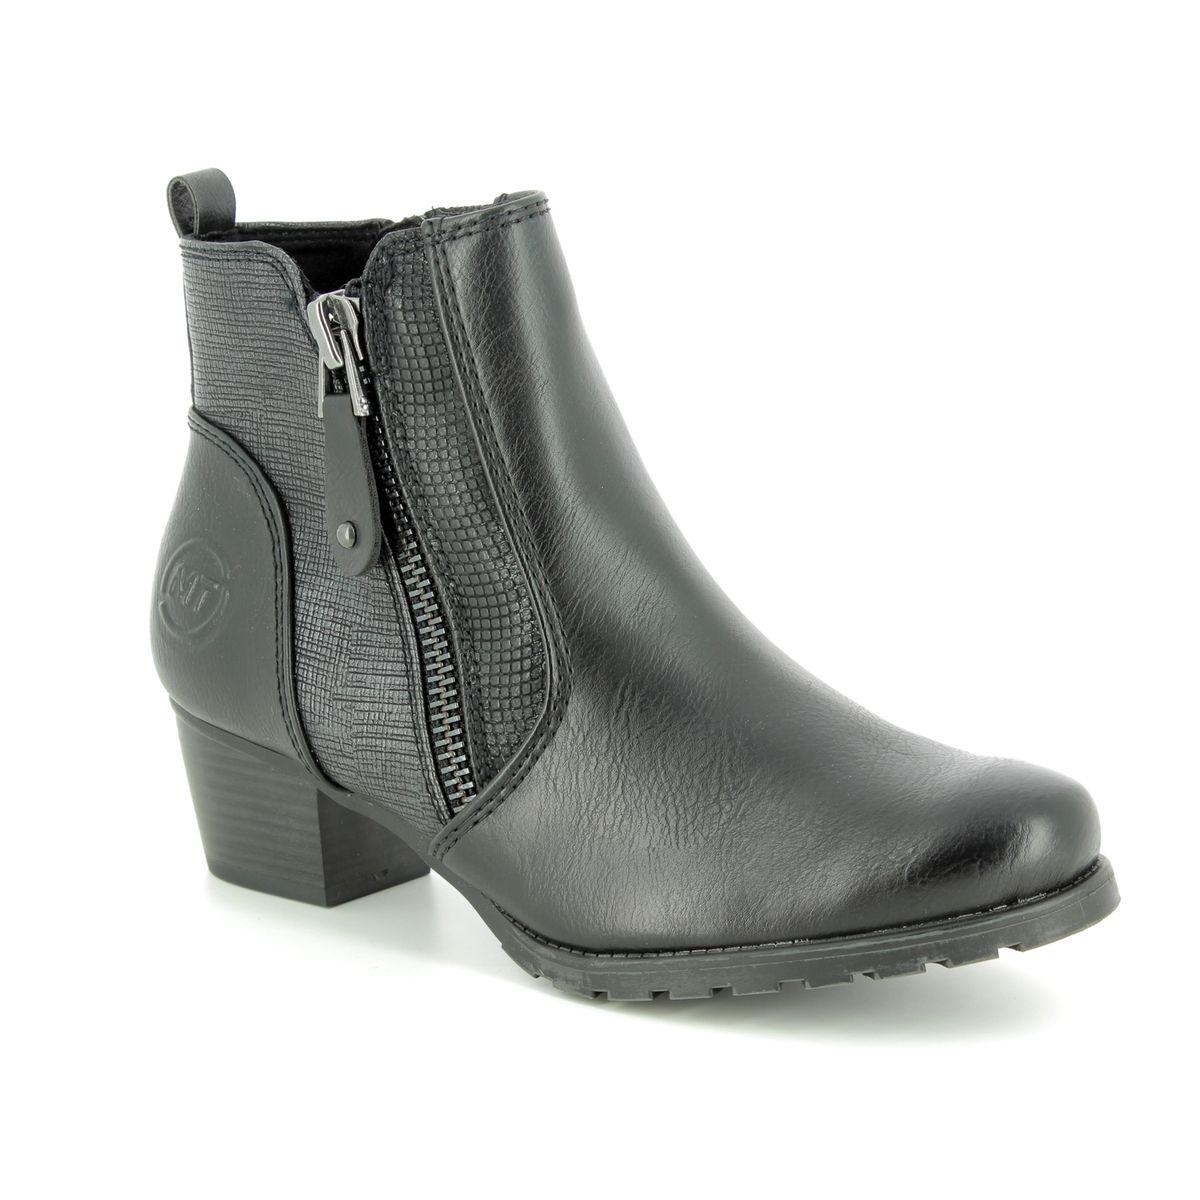 aa72766dfce4 Marco Tozzi Ankle Boots - Black - 25309 21 096 ROSANZIP